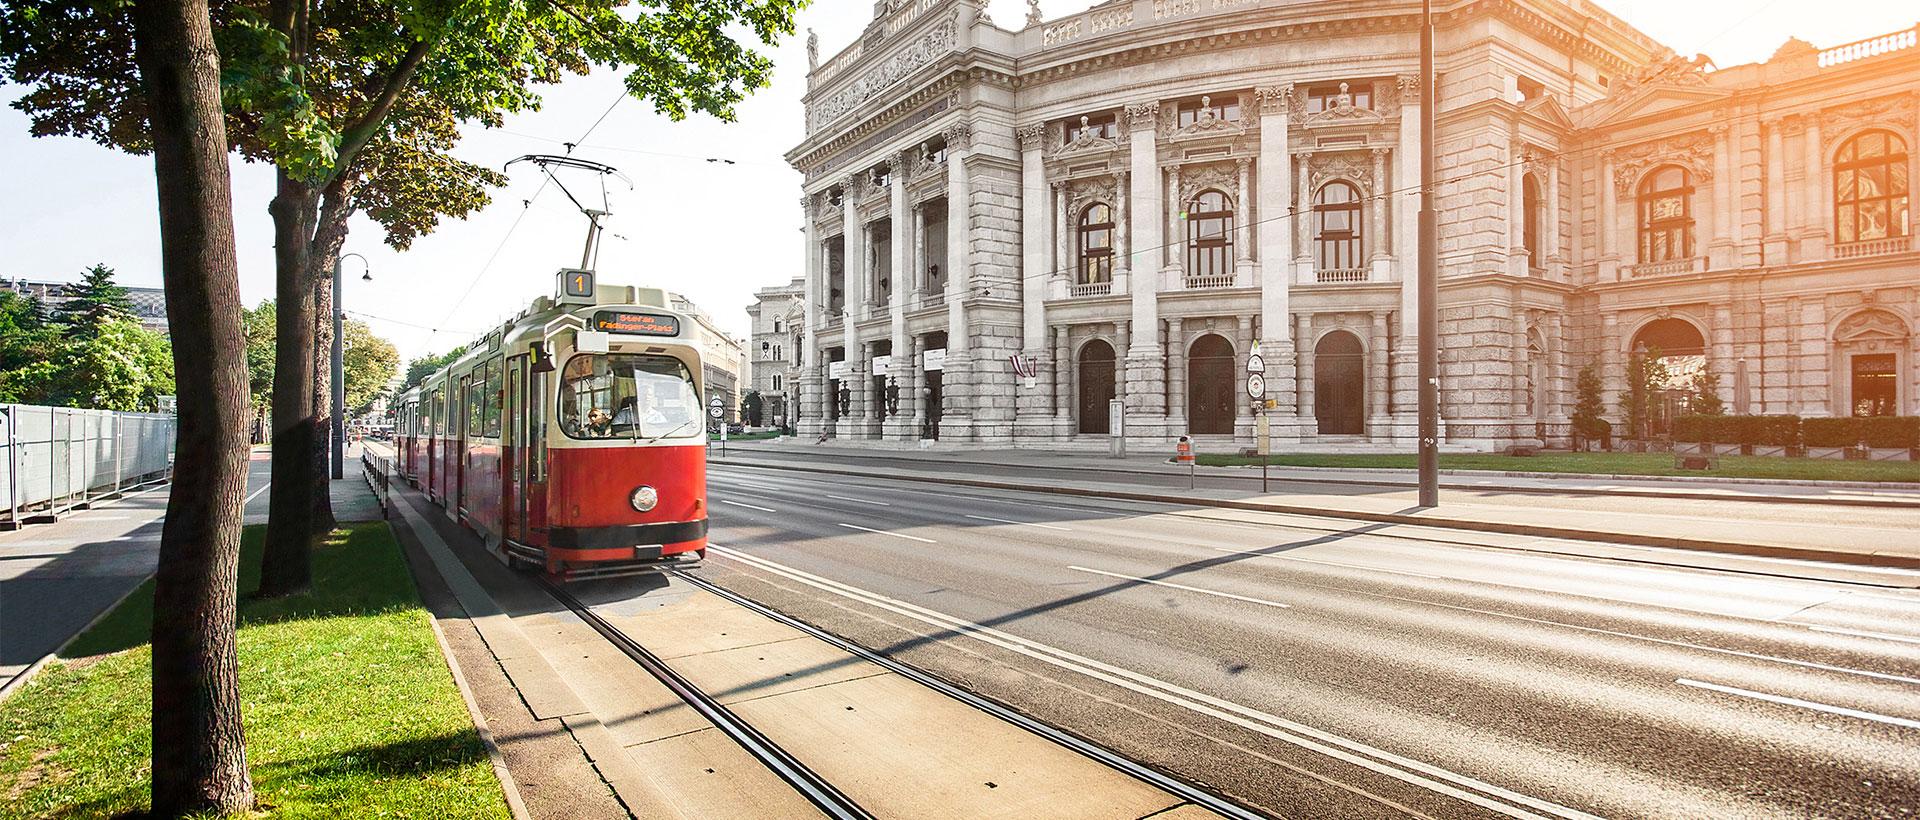 Flixbus Salzburg Wien